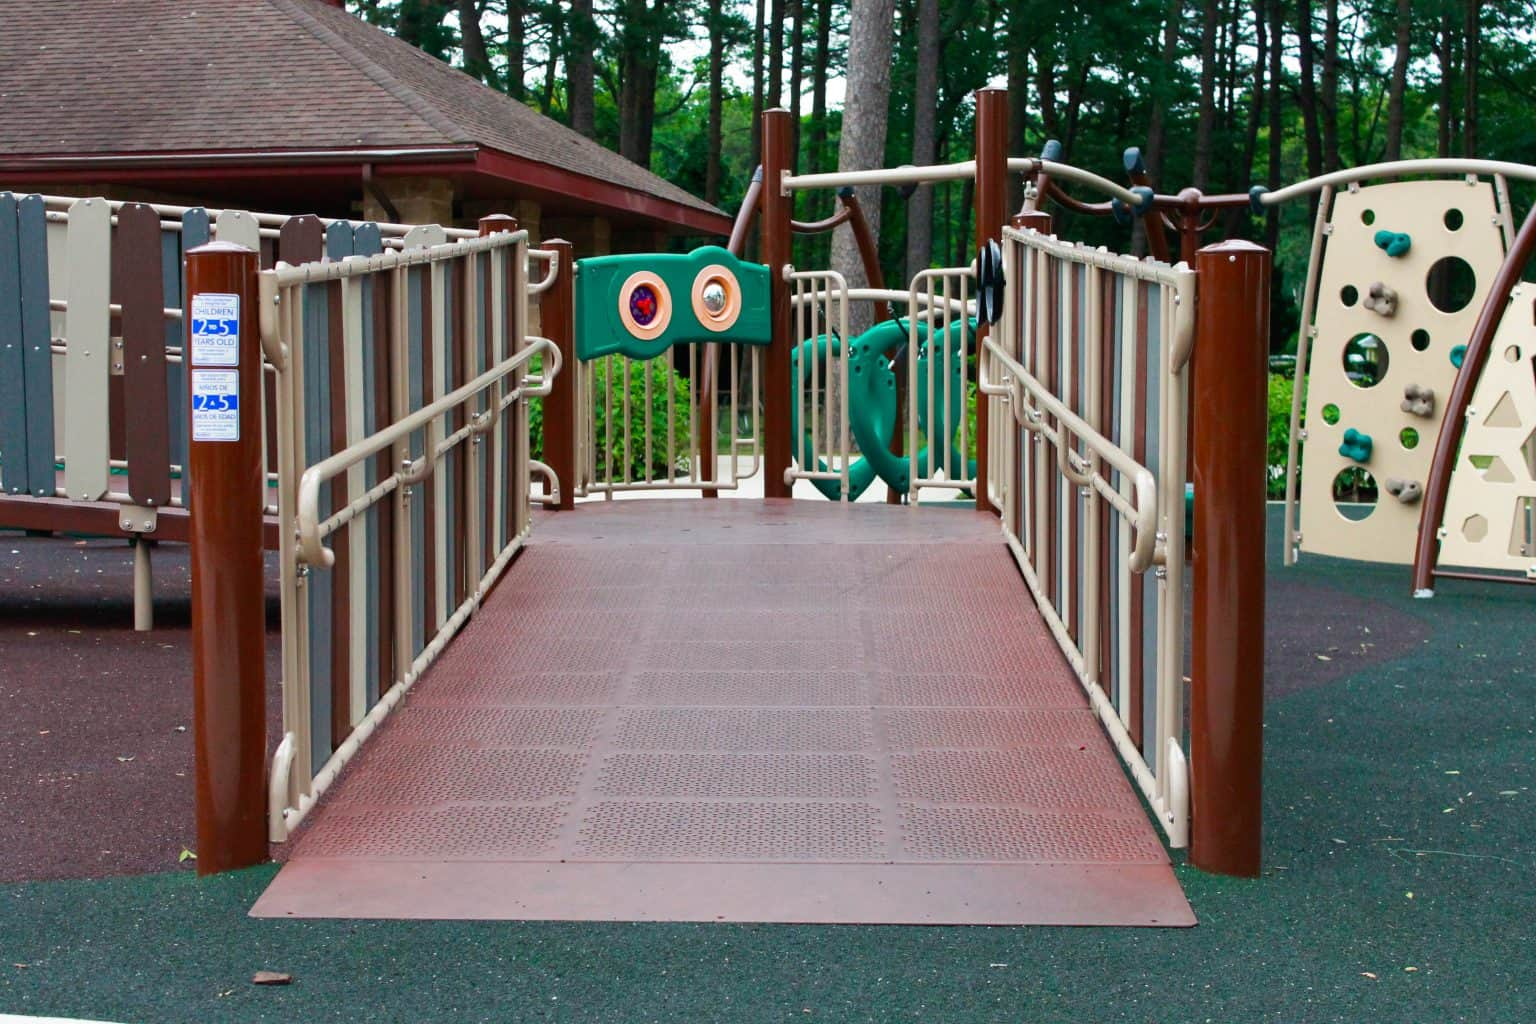 windward-beach-park-playground-brick-nj_28266704135_o-1536x1024